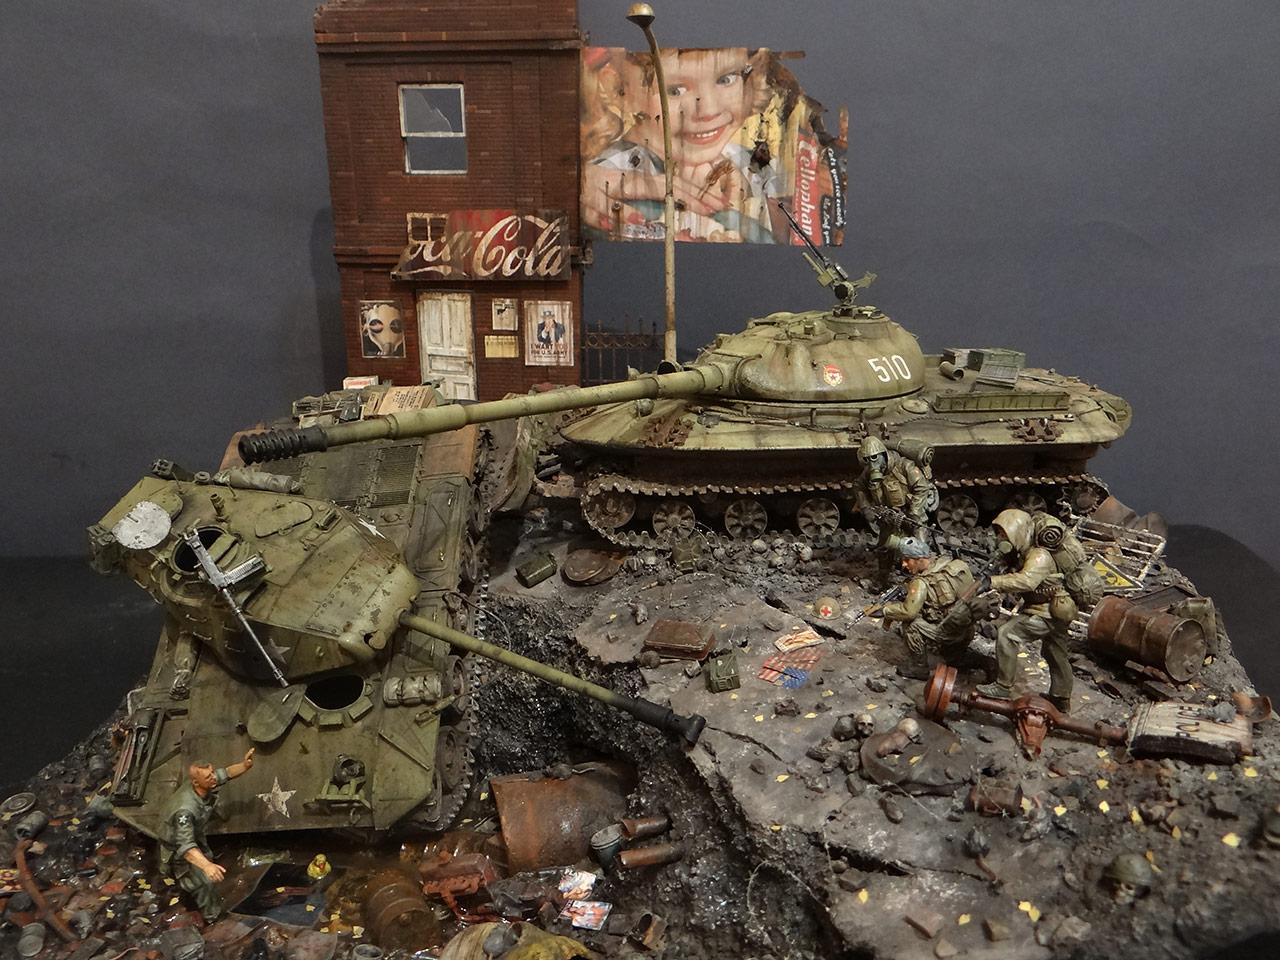 http://www.diorama.ru/_img/content/gallery/4629/1.jpg